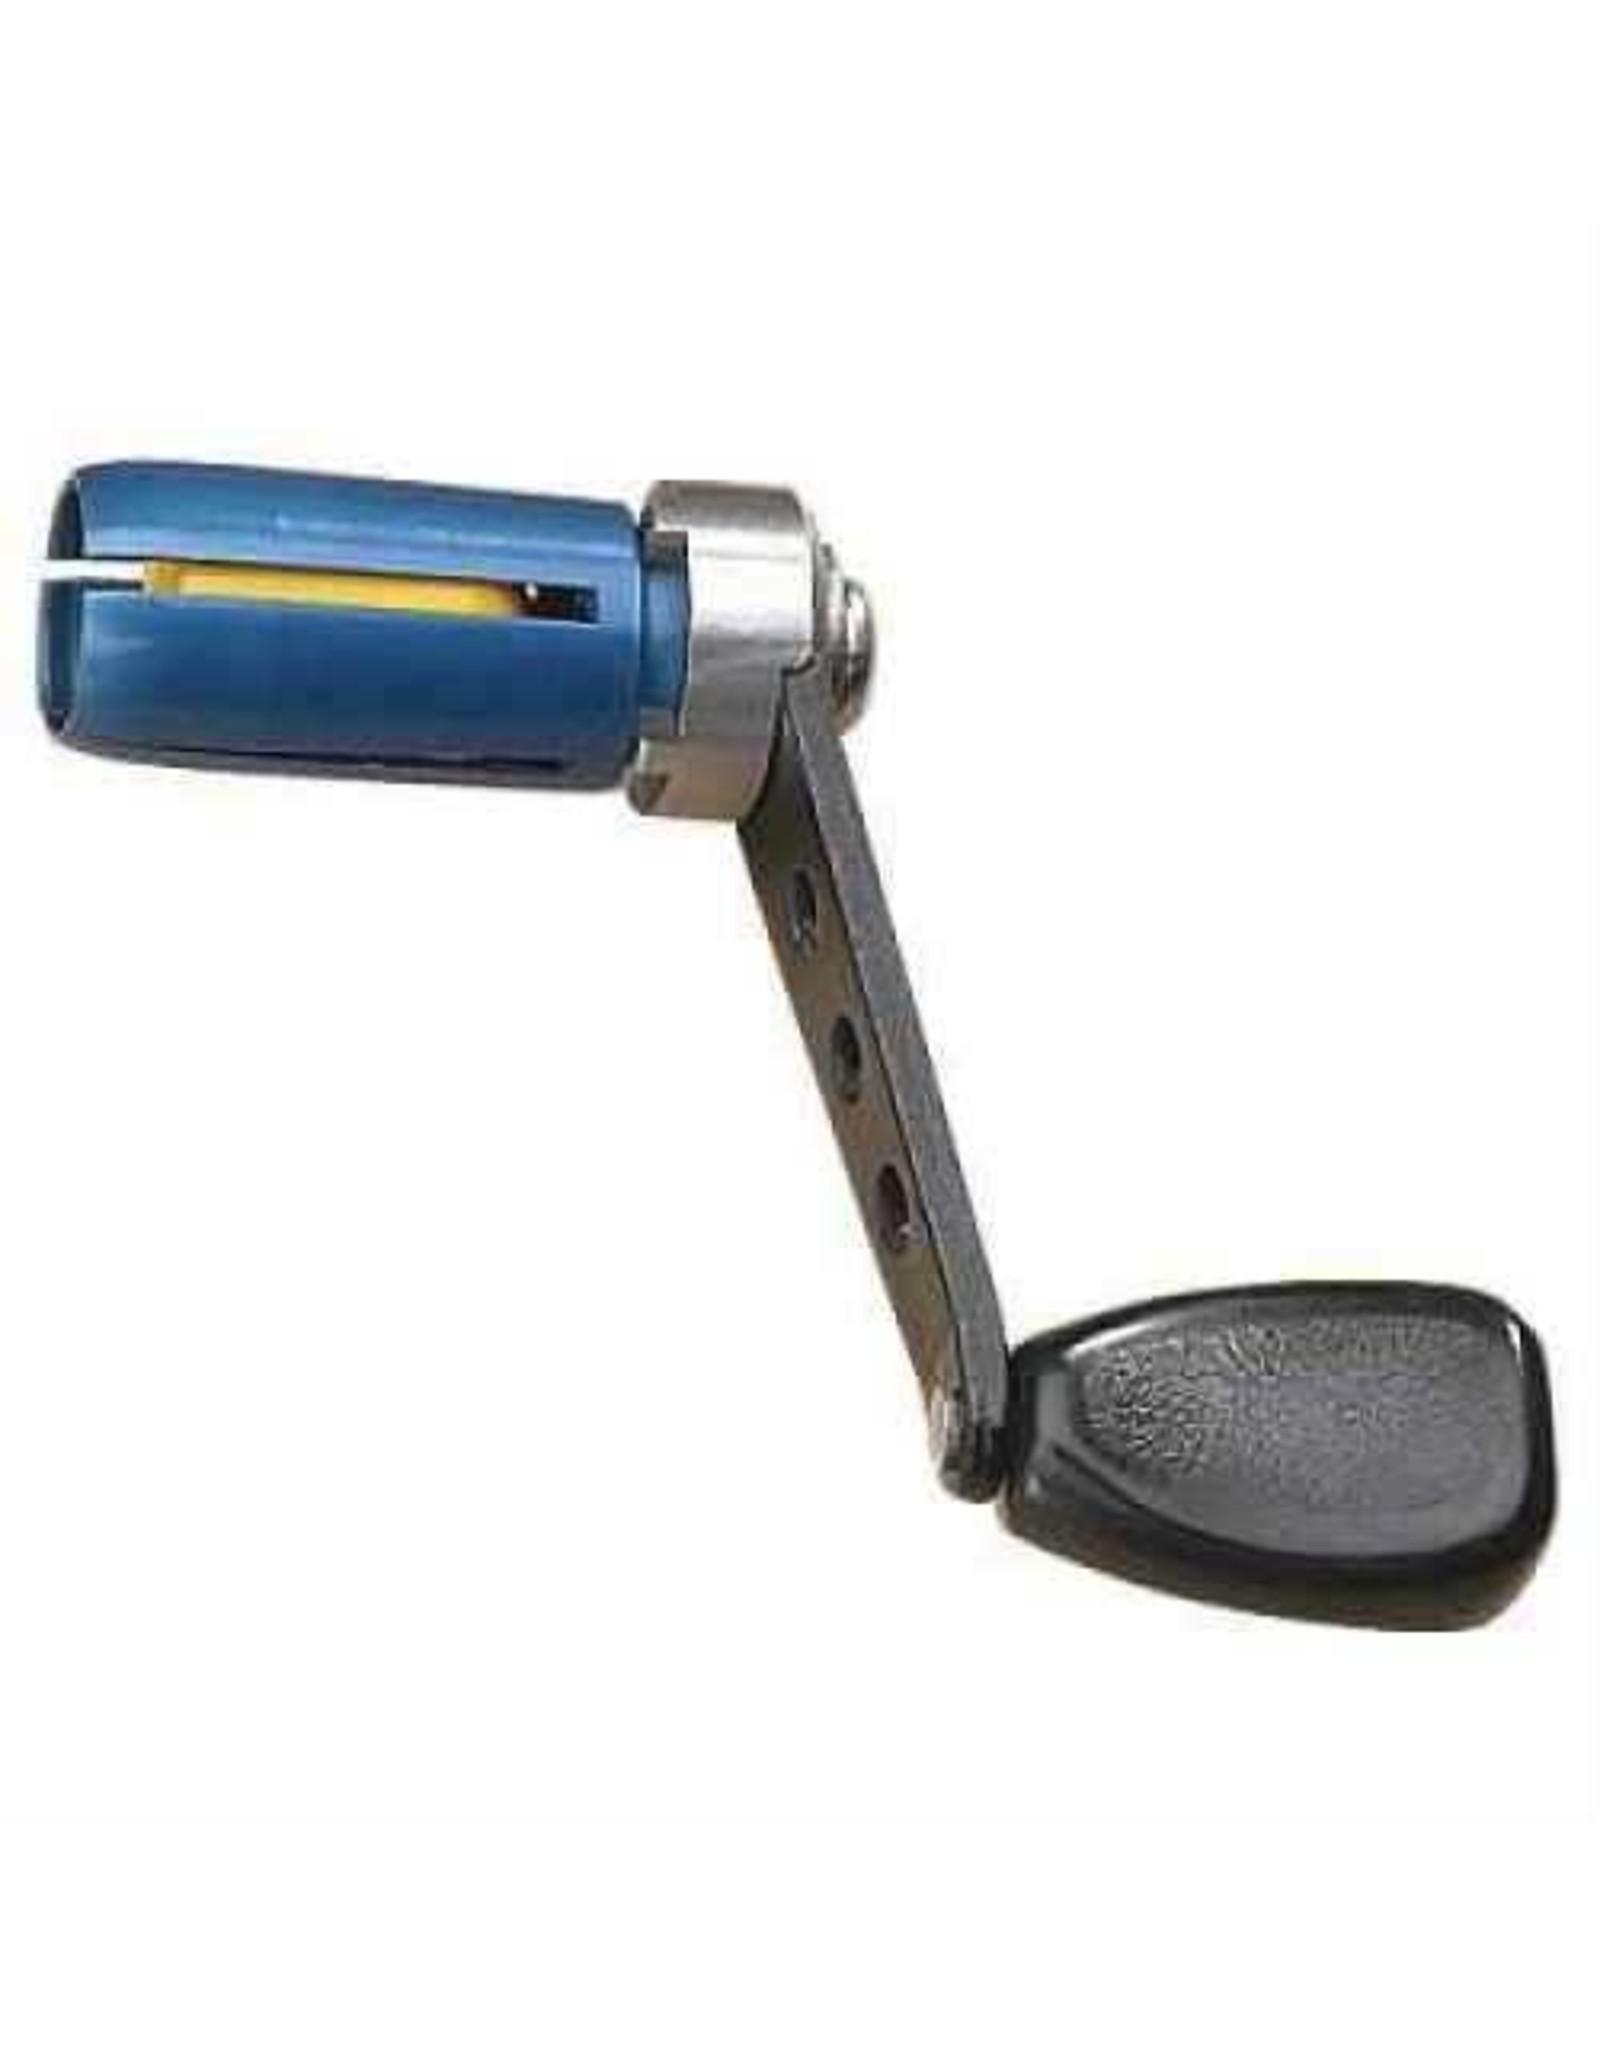 Briley 12 ga Speed Wrench - Choke Tube Wrench